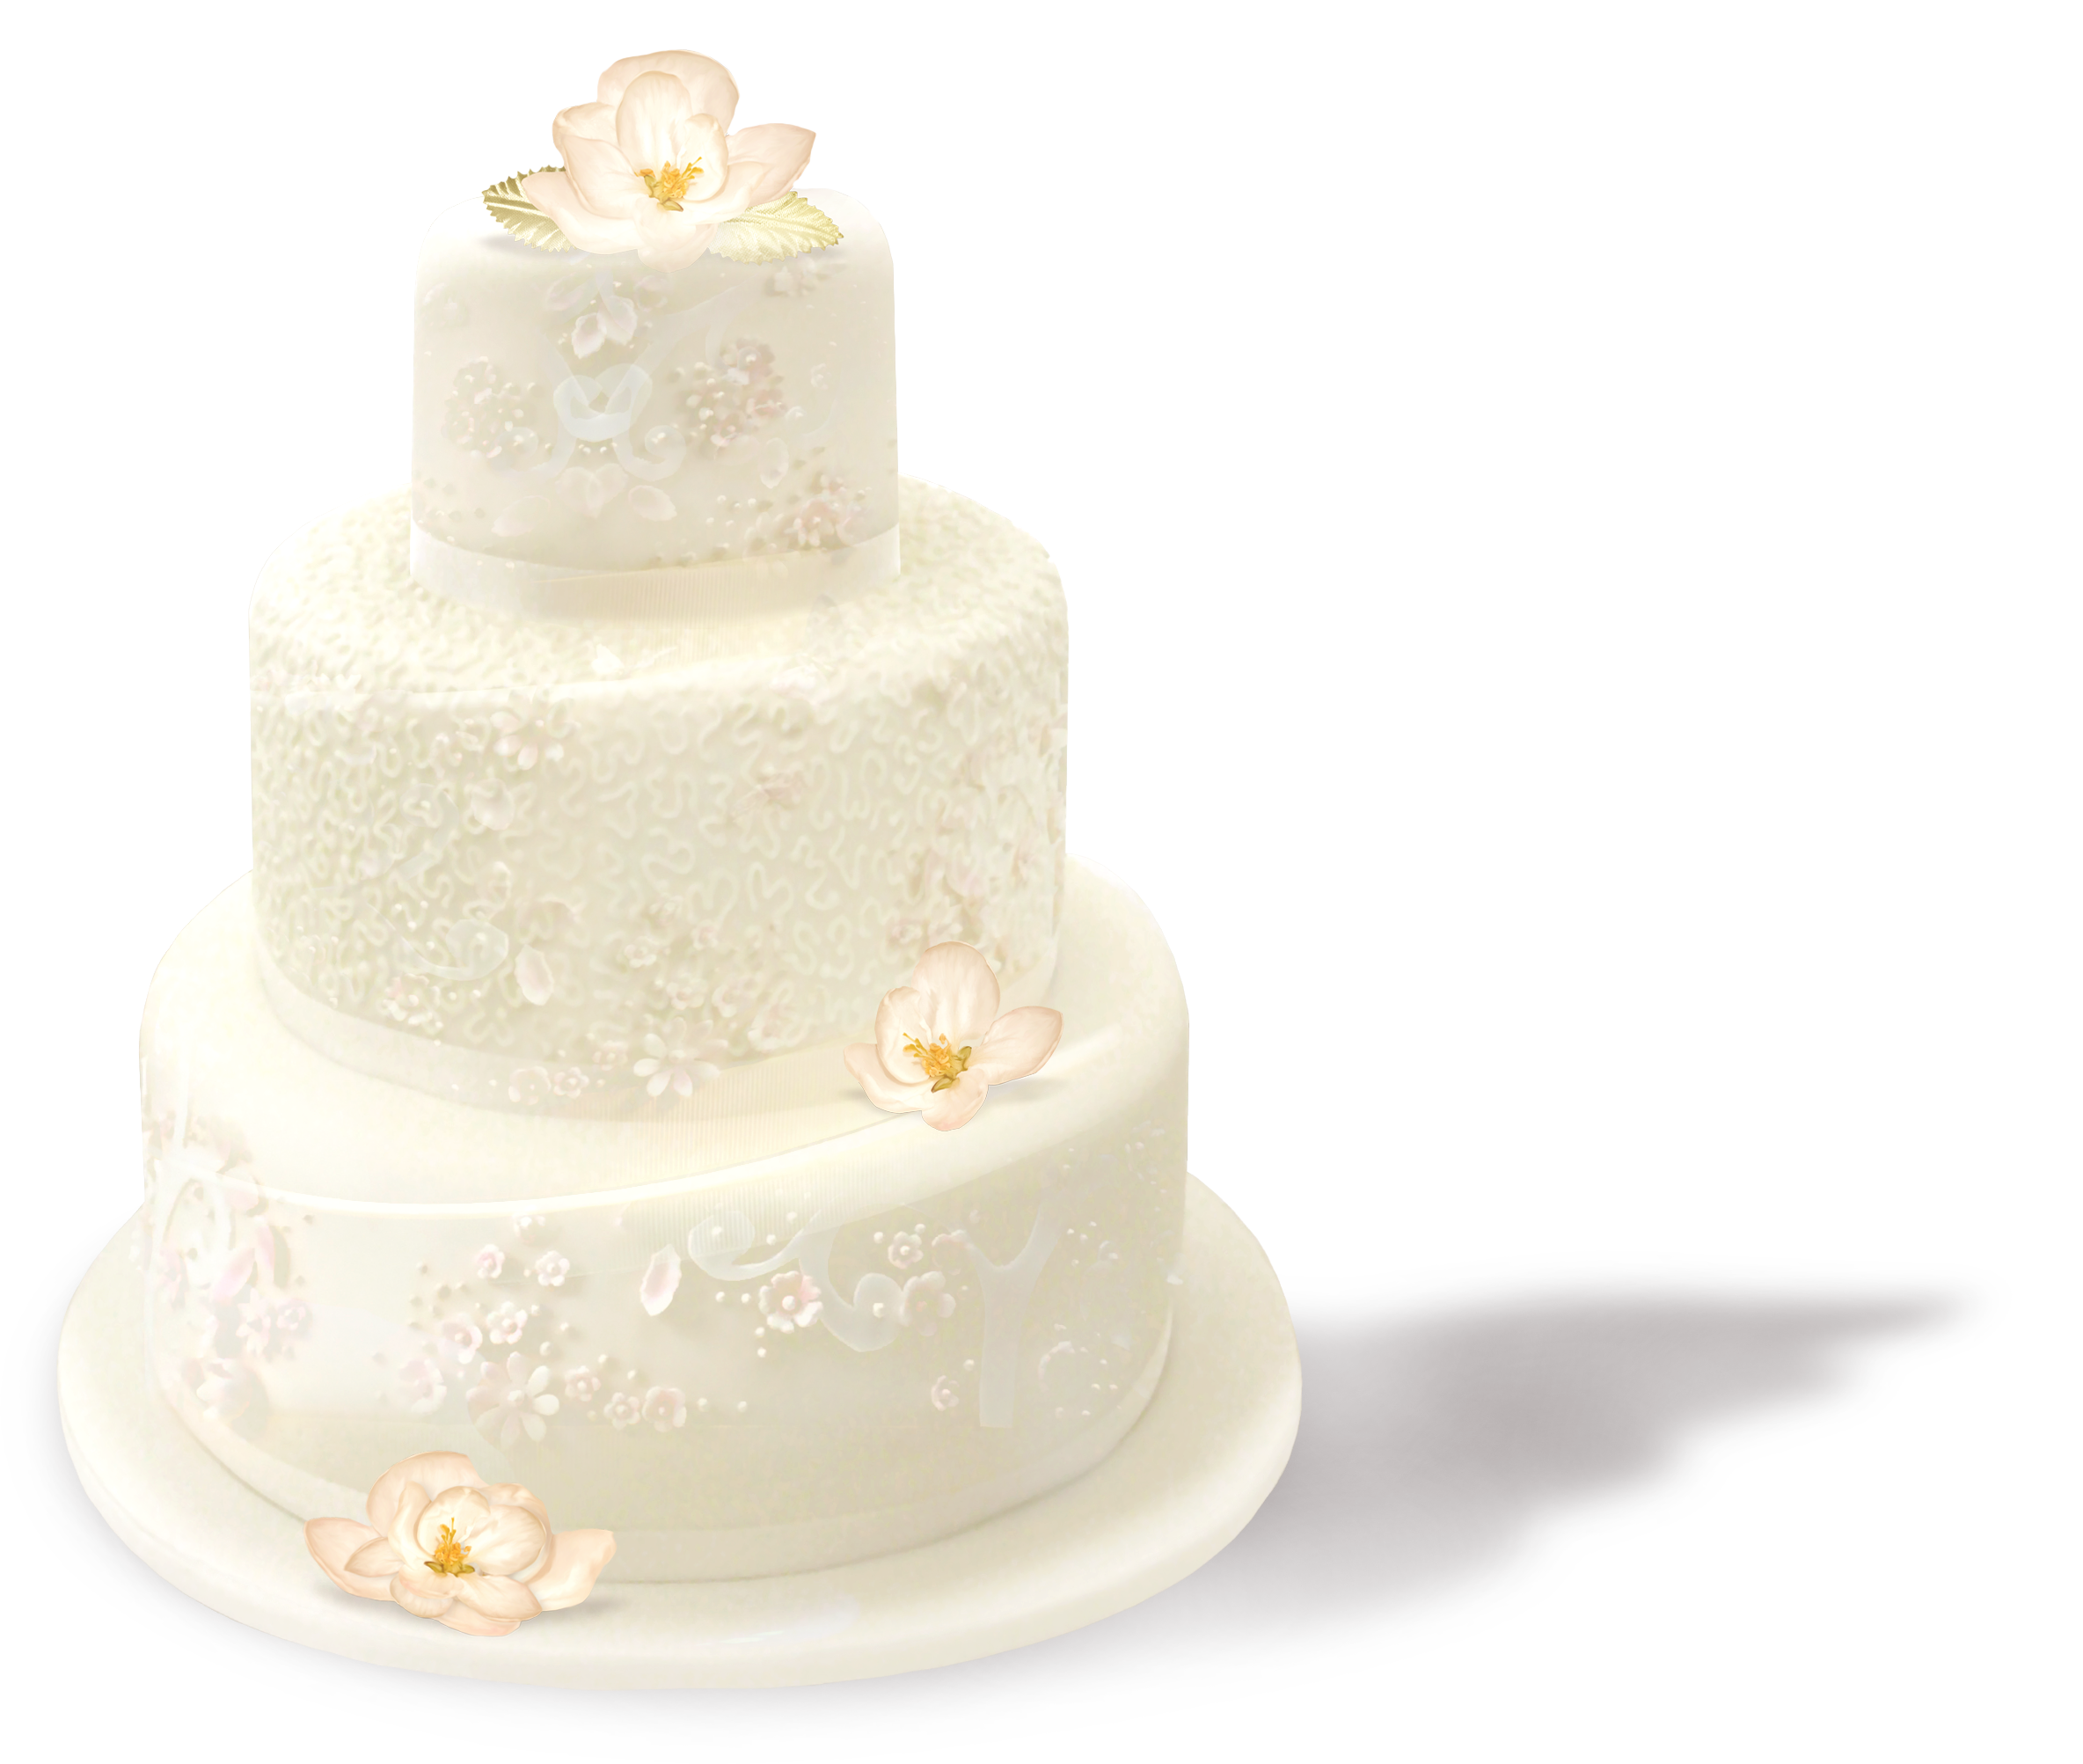 Wedding Cakes Png Google Zoeken Cake Wedding Cakes Vanilla Cake